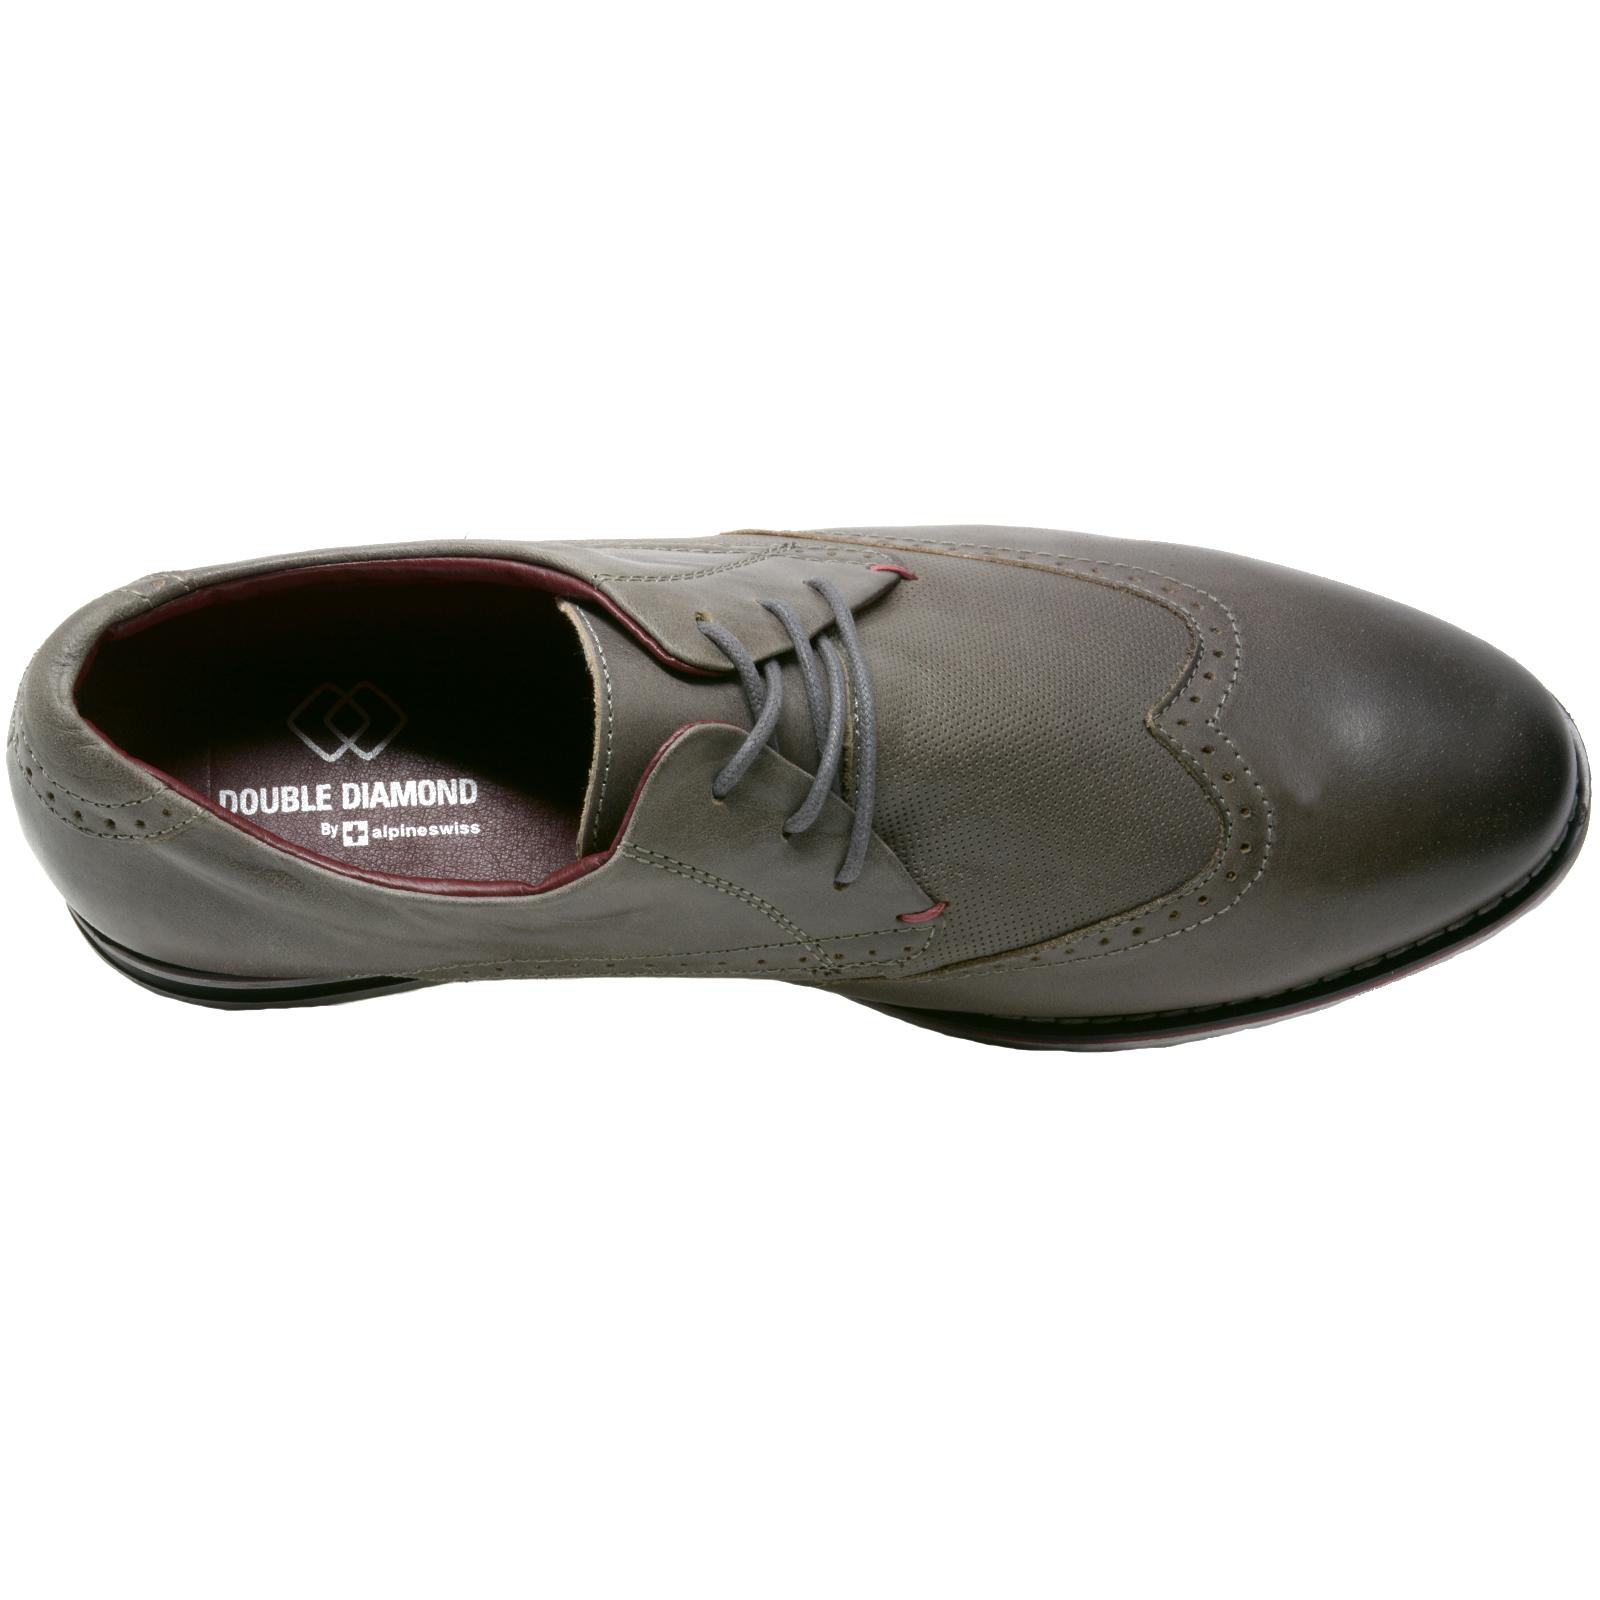 Double-Diamond-By-Alpine-Swiss-Men-s-Oxfords-Genuine-Leather-Wingtip-Dress-Shoes